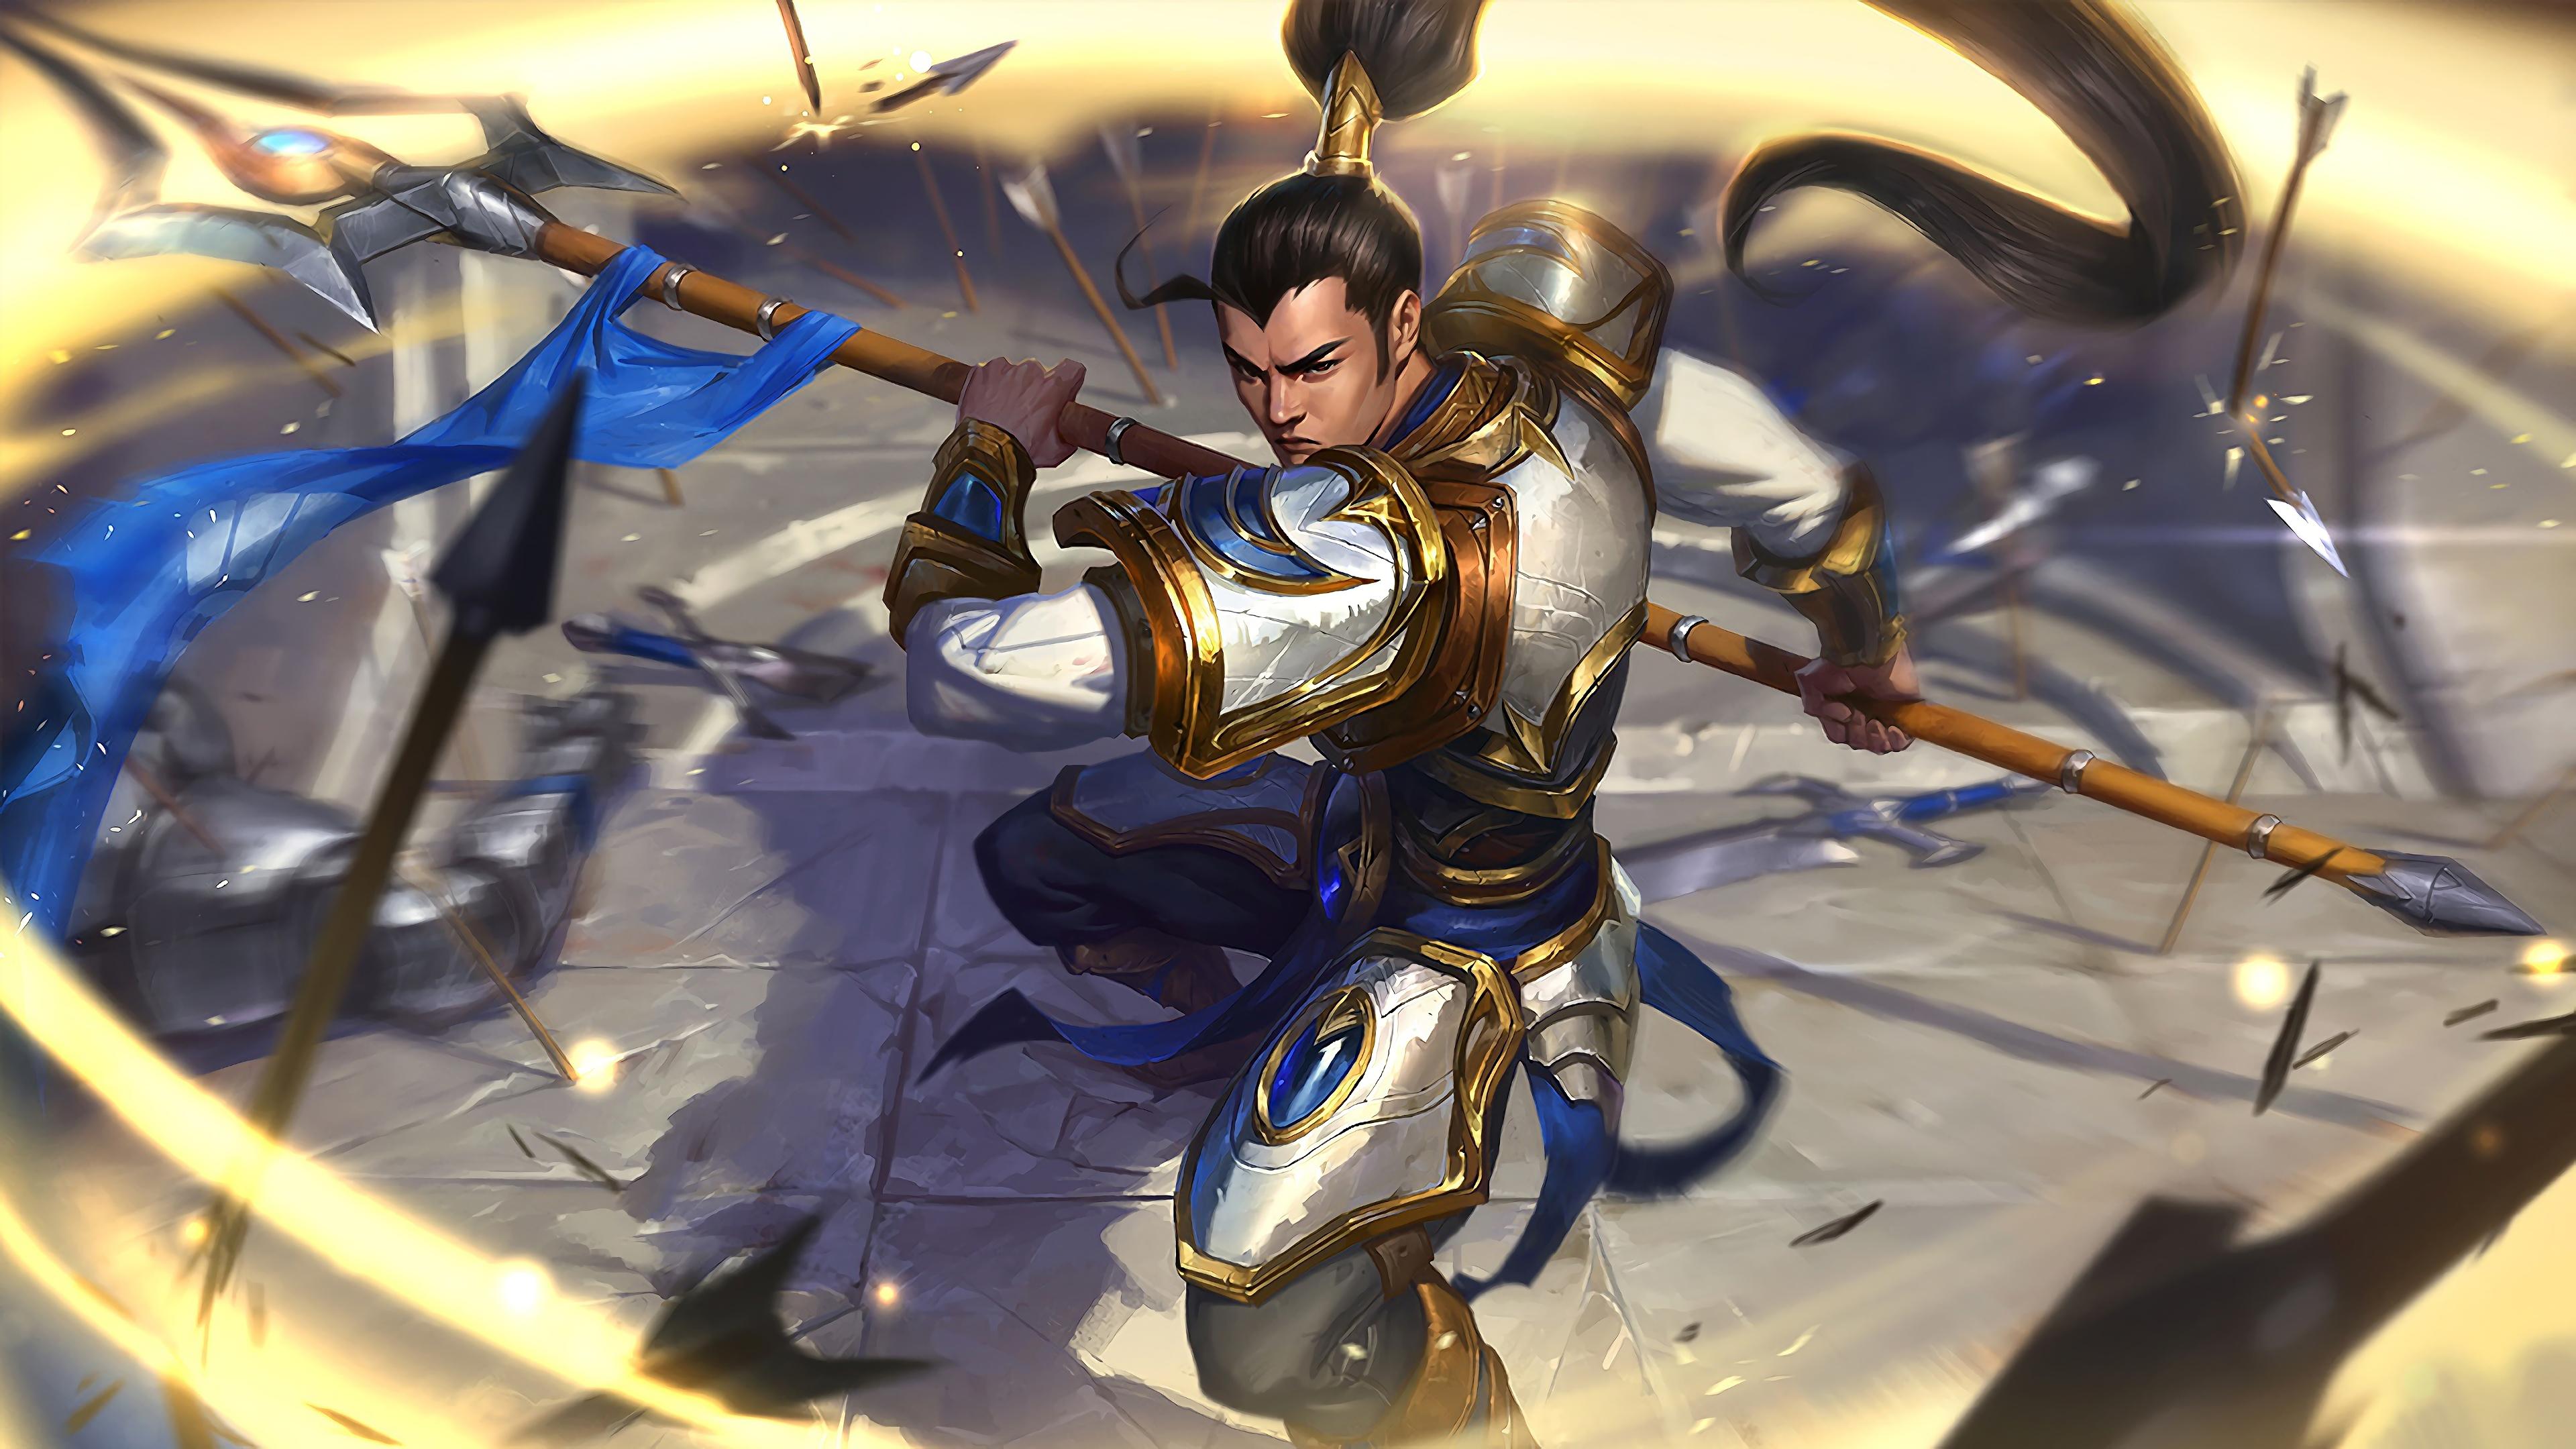 xin zhao splash art update lol league of legends lol 1574102847 - Xin Zhao Splash Art Update LoL League of Legends lol - Xin Zhao, league of legends